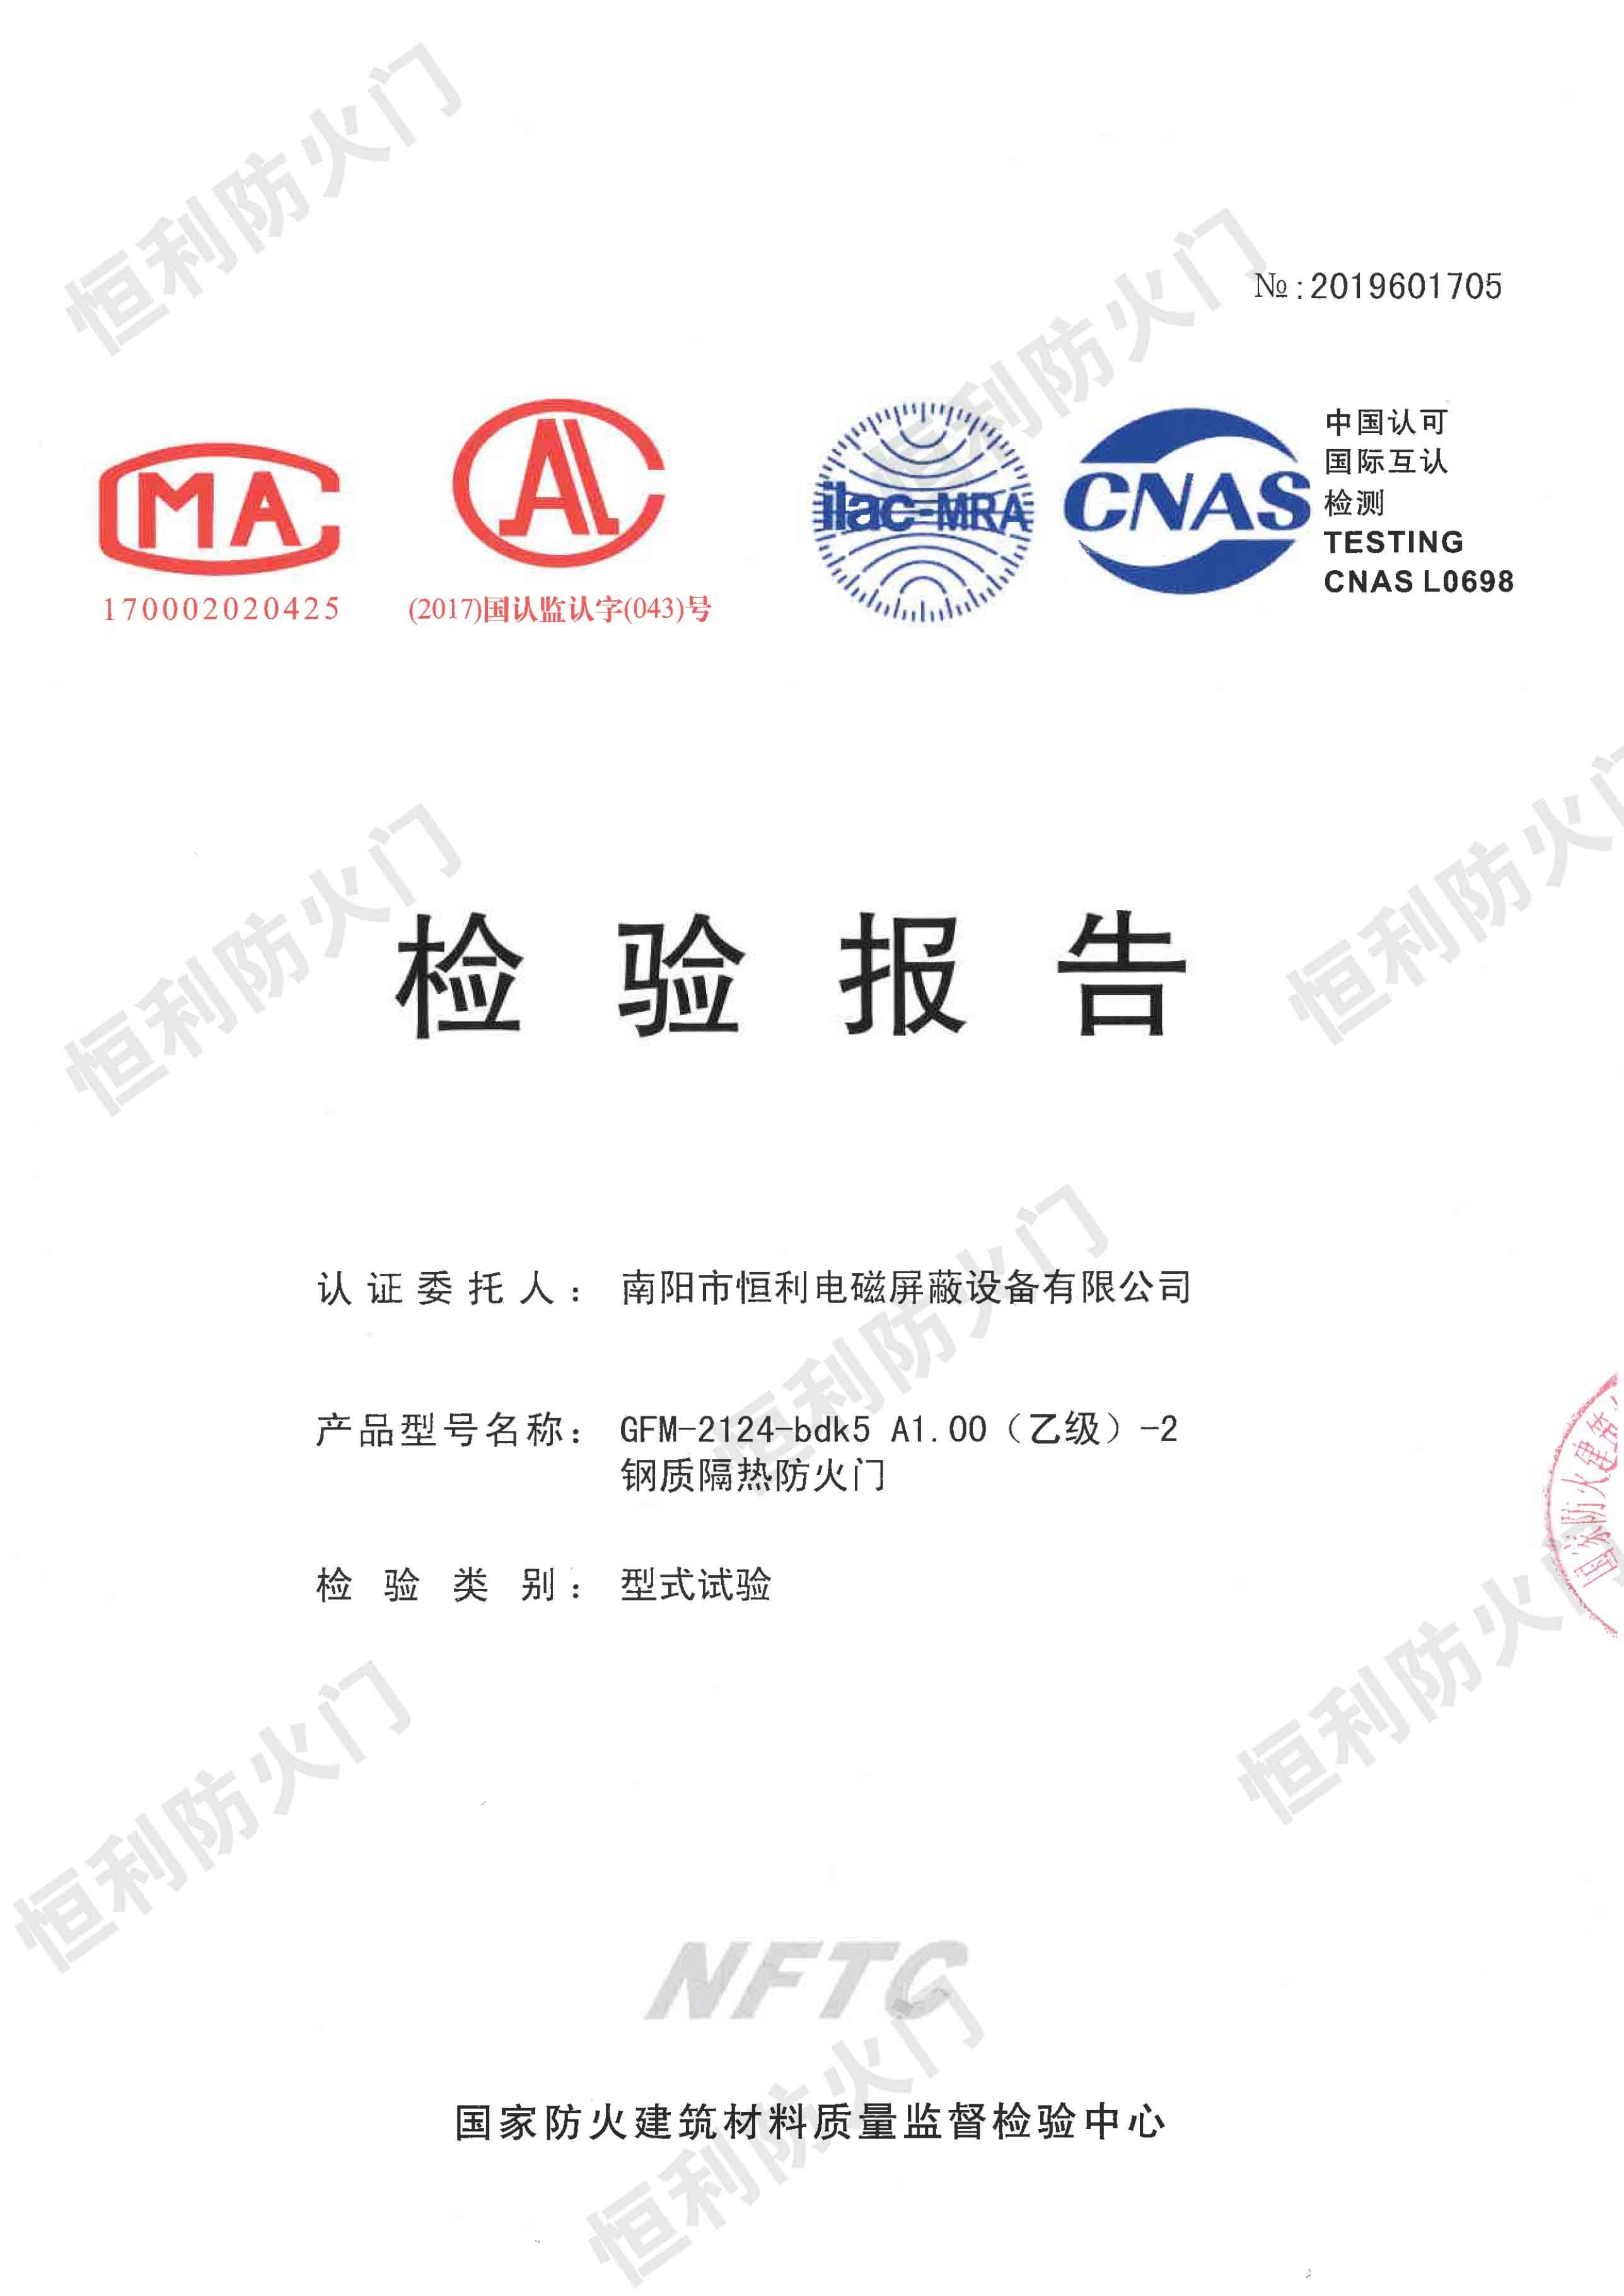 GFM-2124-bdk5 A1.00(乙级)-2 钢质隔热防火门